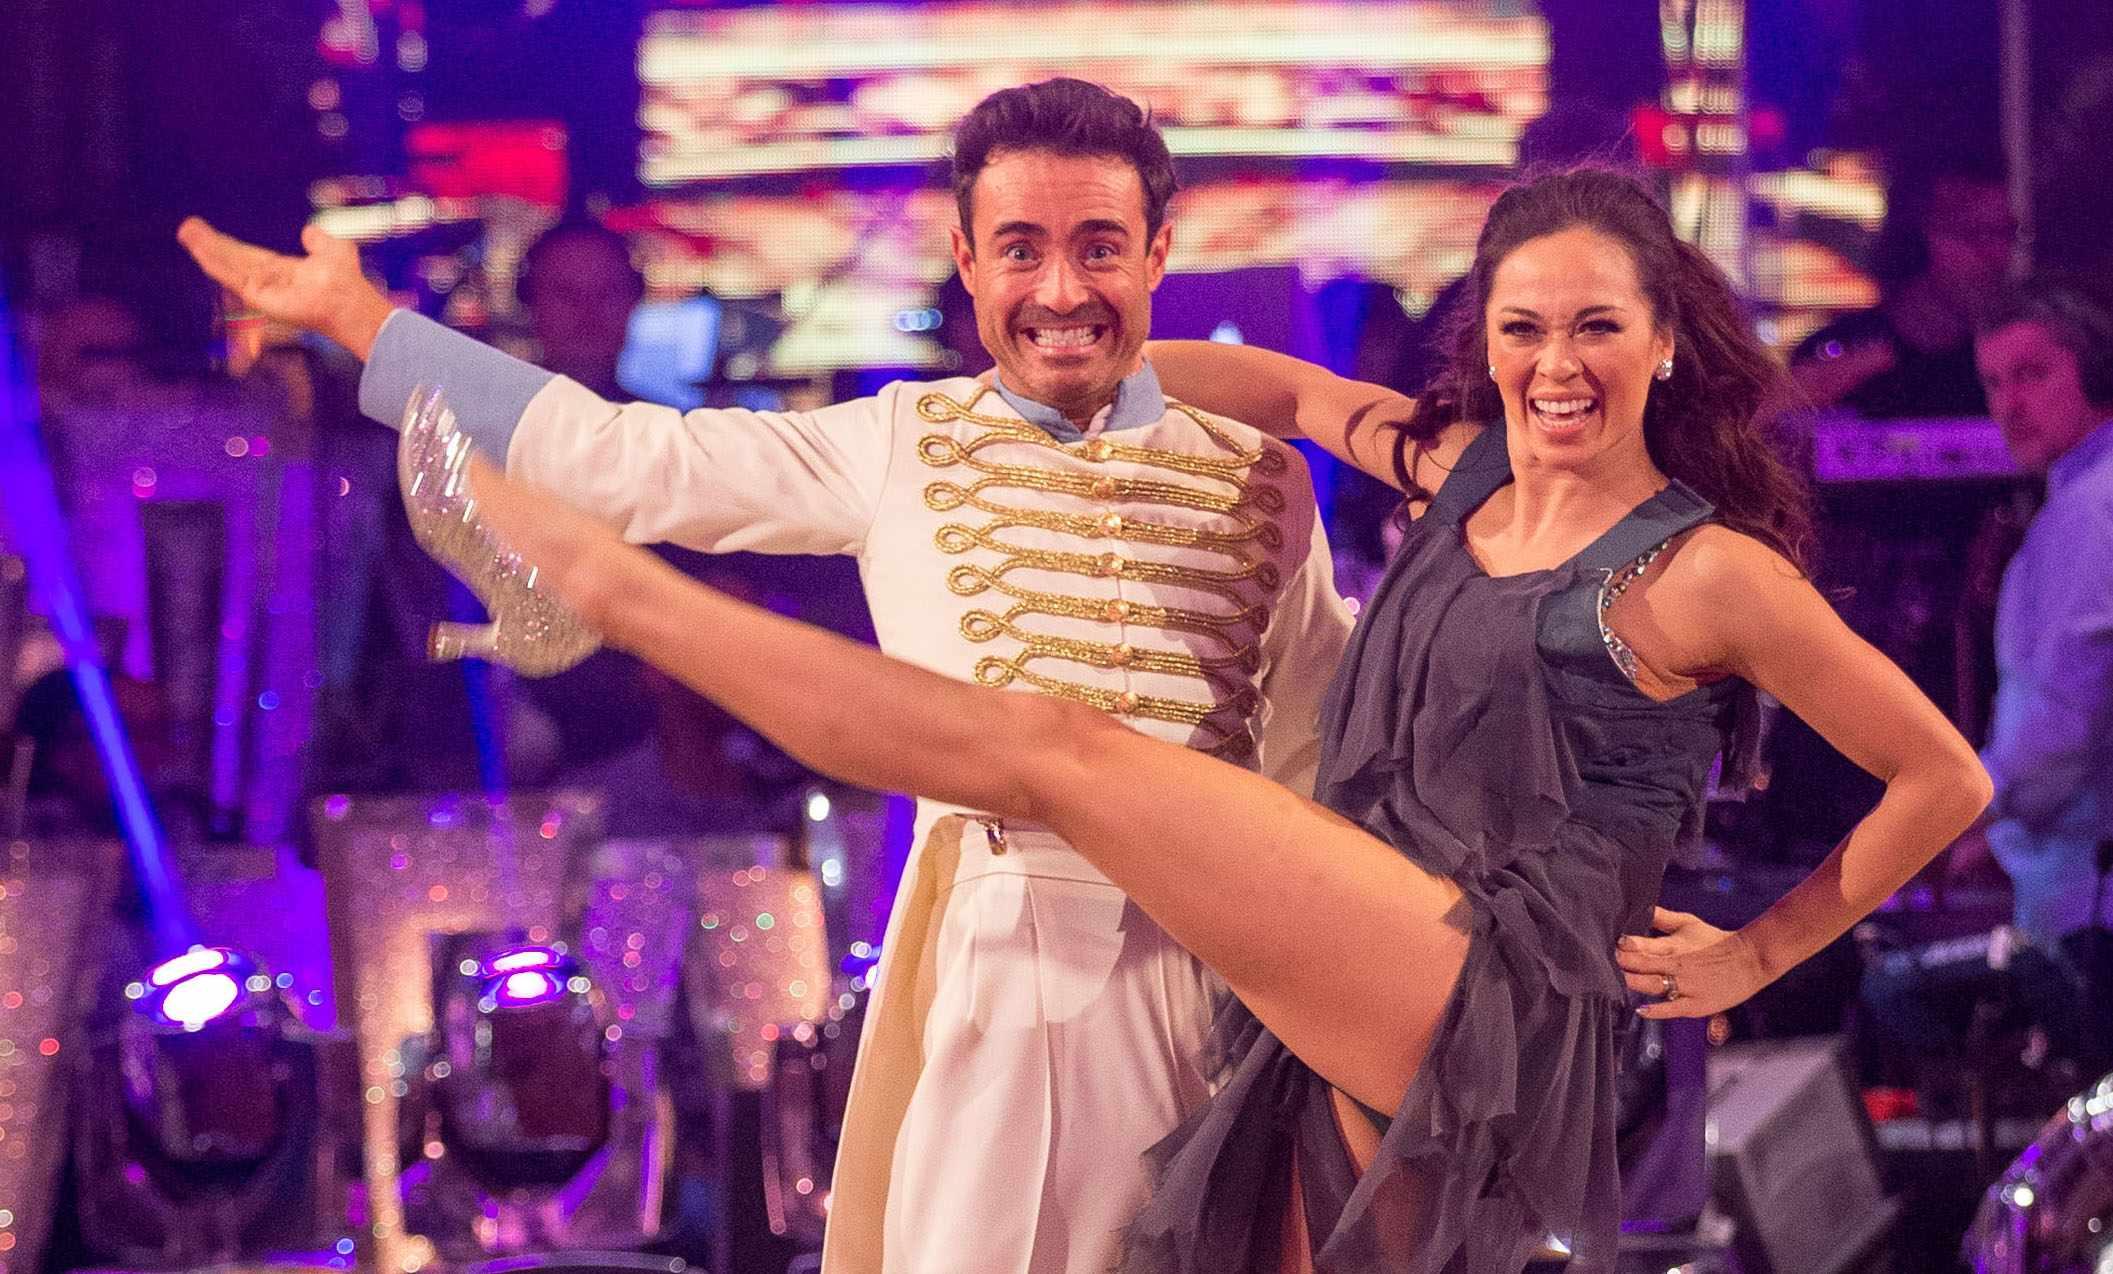 Joe McFadden in Strictly Come Dancing 2017 Final